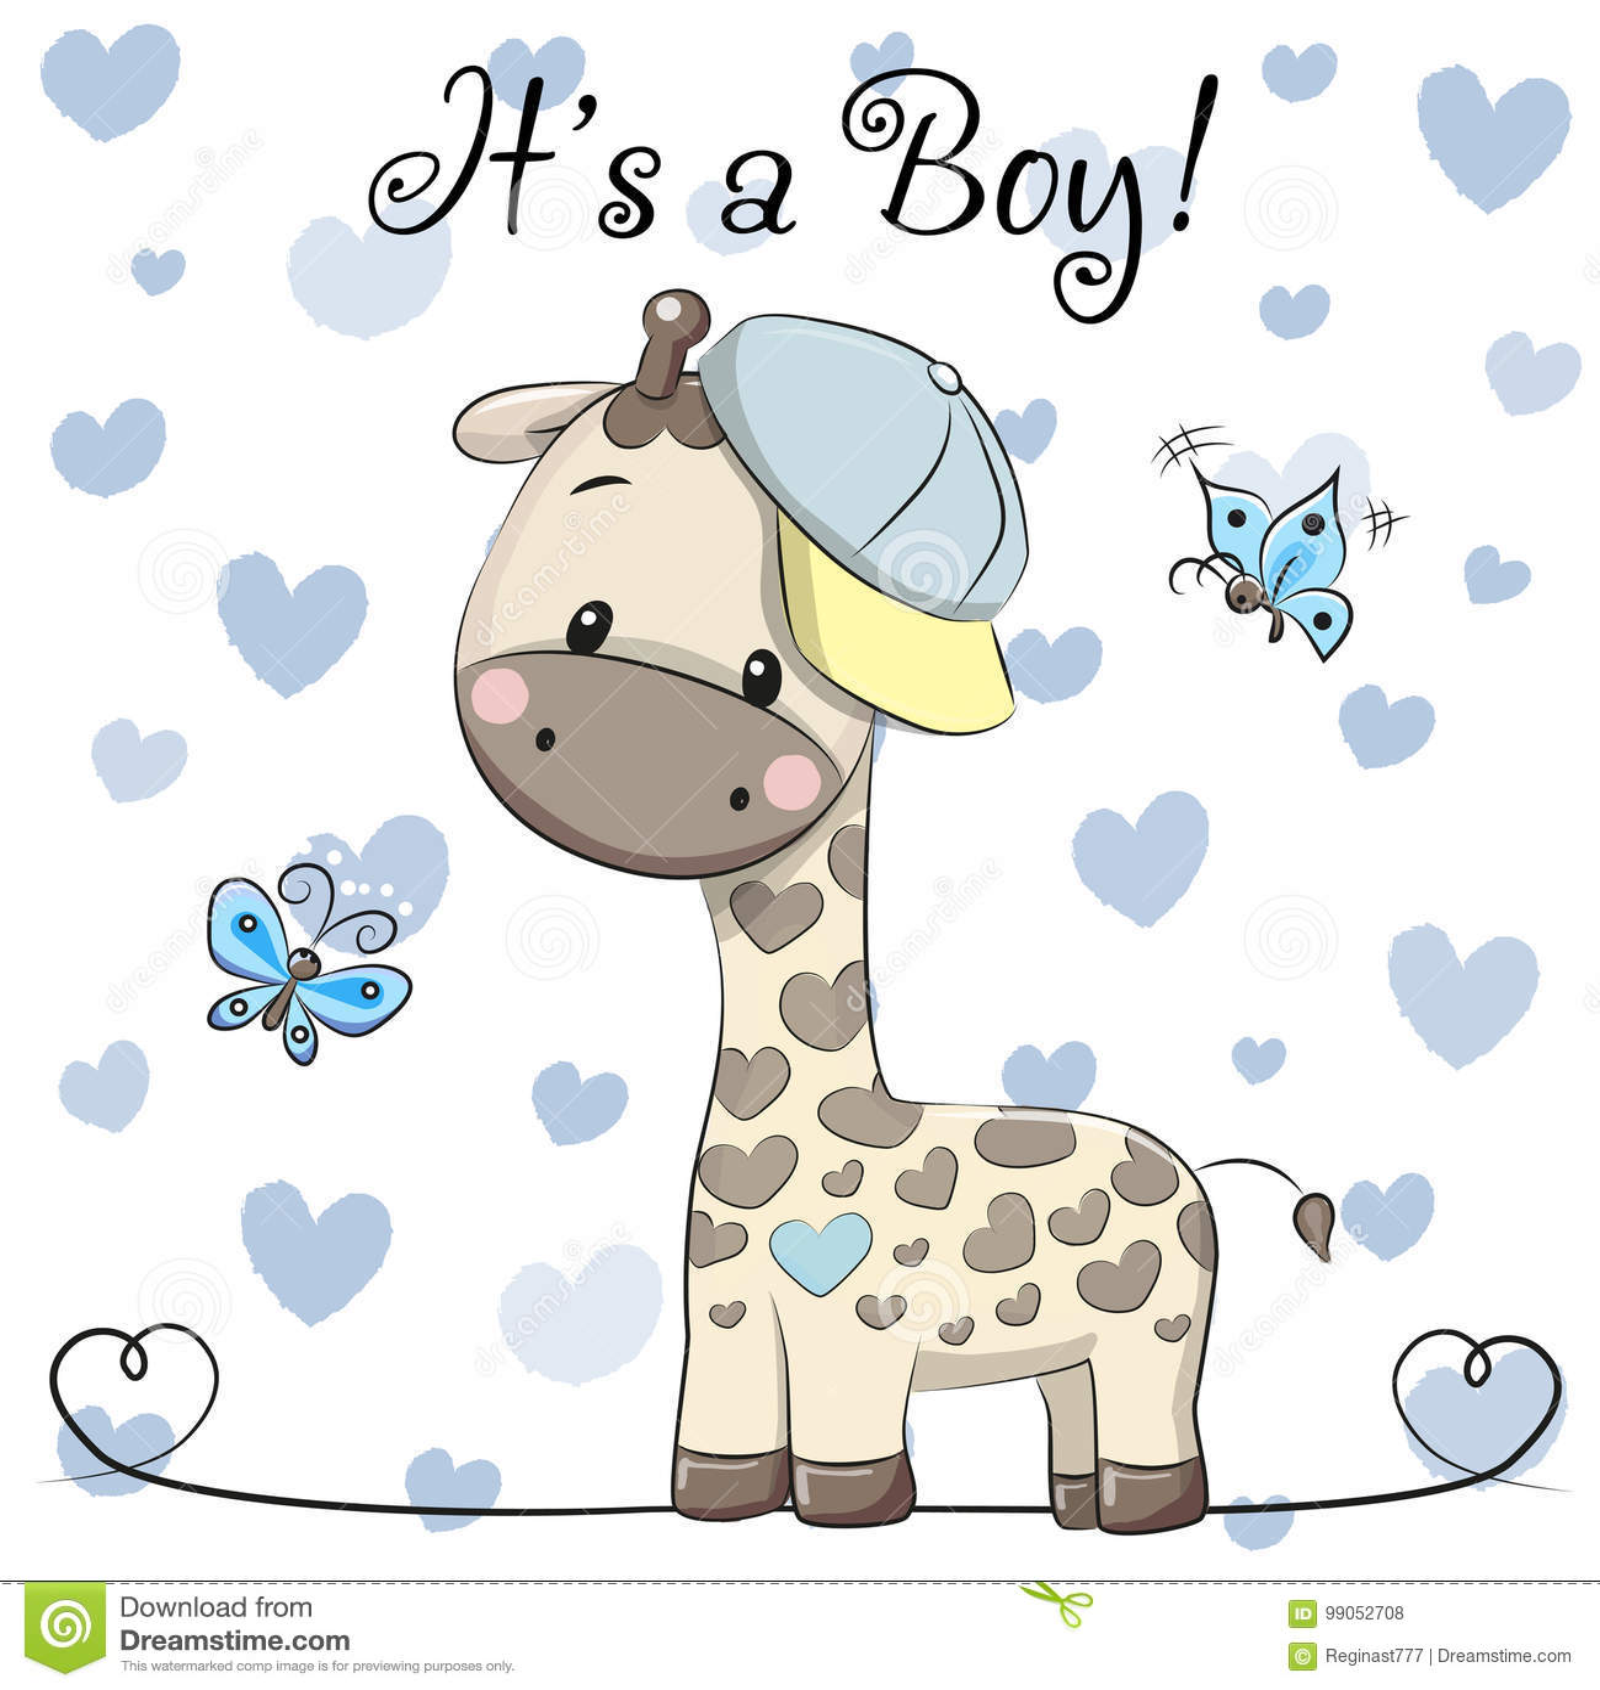 Baby Shower Greeting Card with cute Giraffe boy